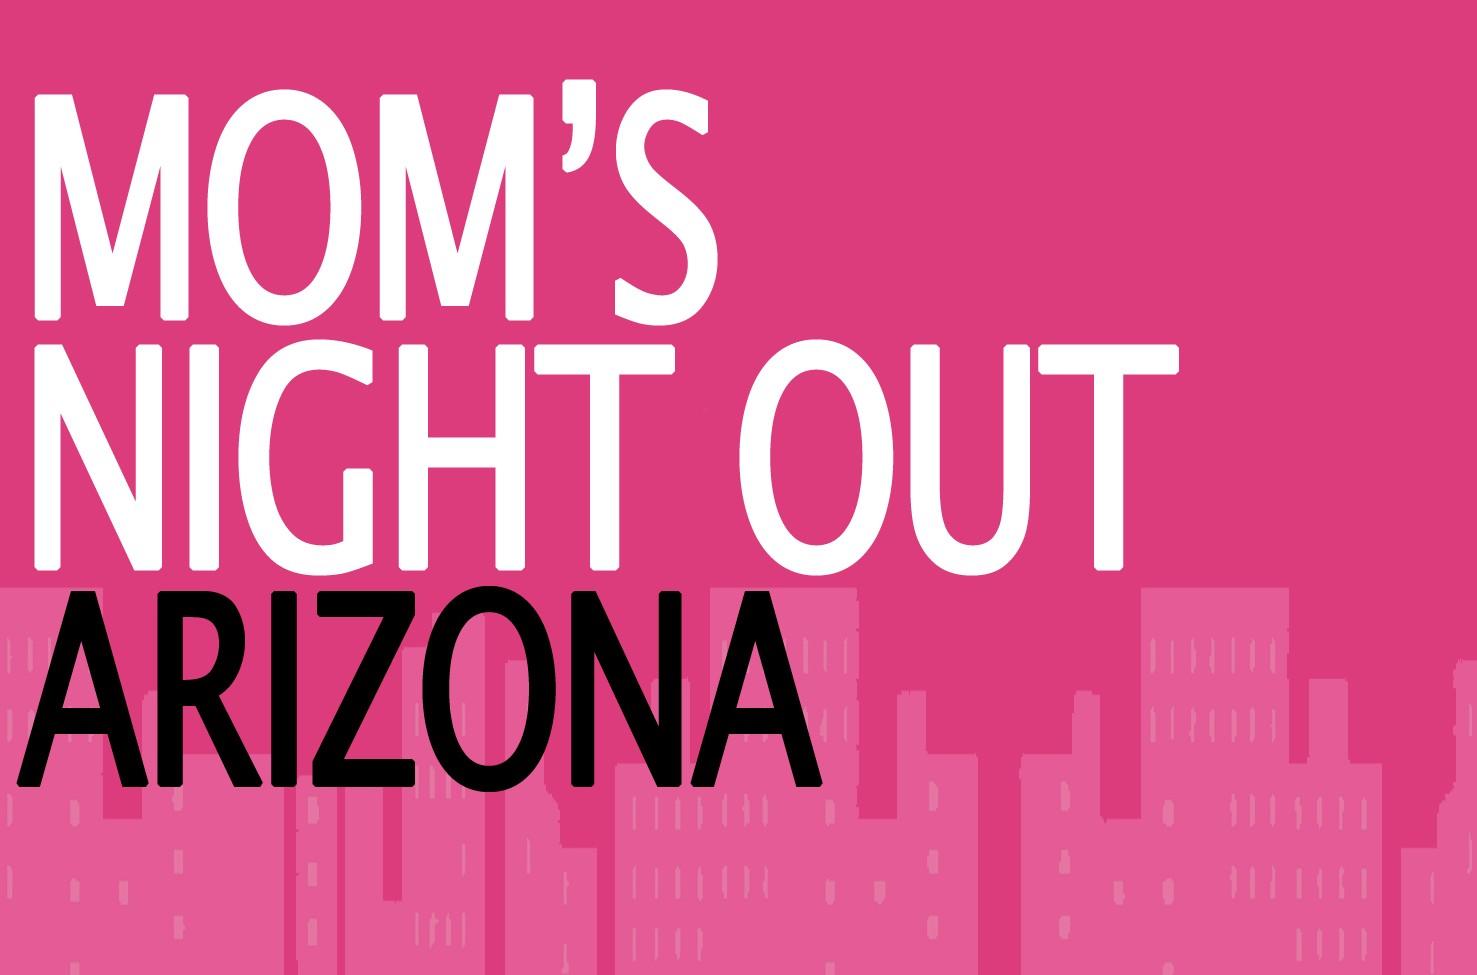 Moms Night Out Arizona